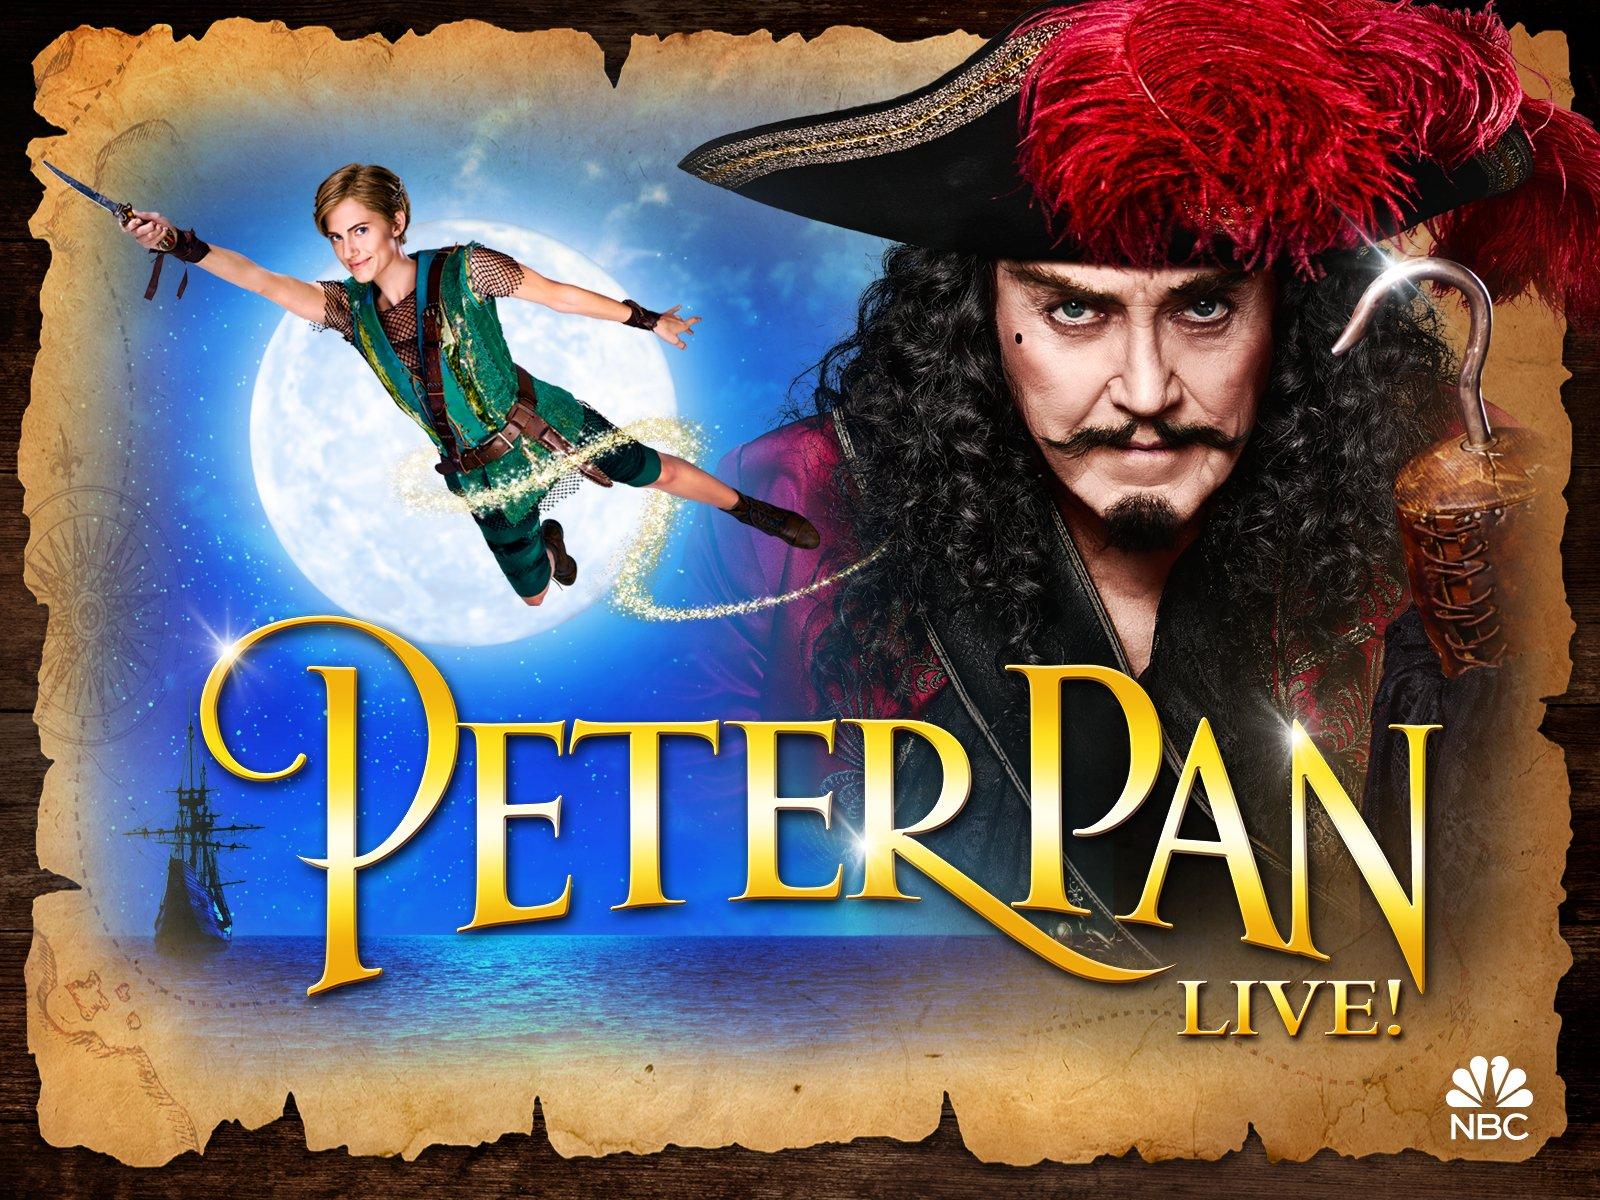 Peter Pan Live - key image.jpg